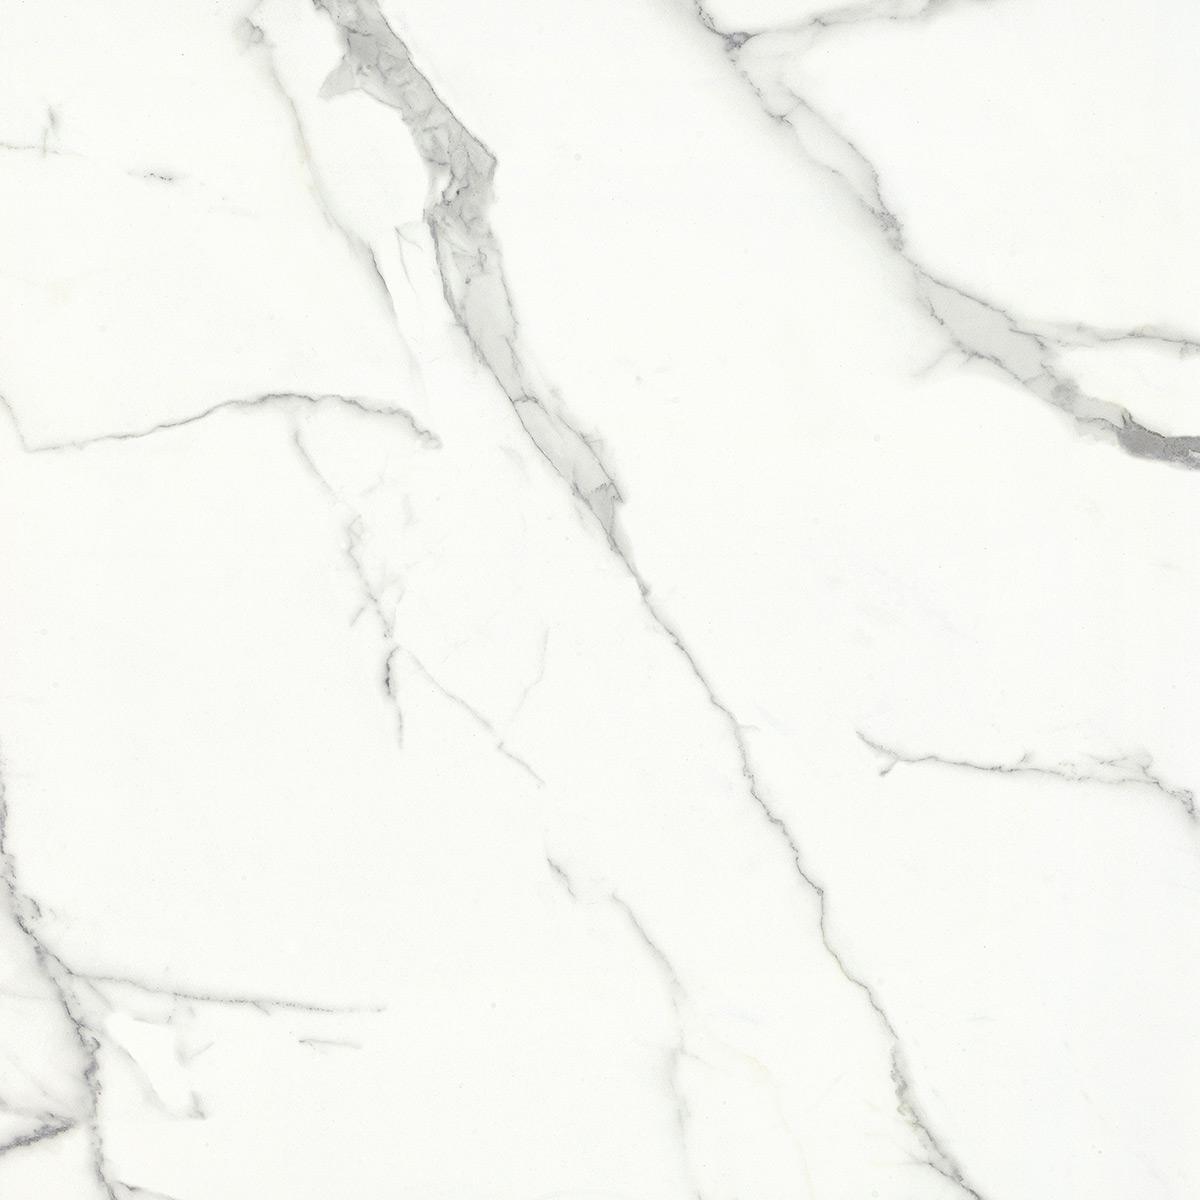 鱼肚白  HPEG80012,800x800mm;HPEG96012,600x900mm;HPEG26012,600x1200mm